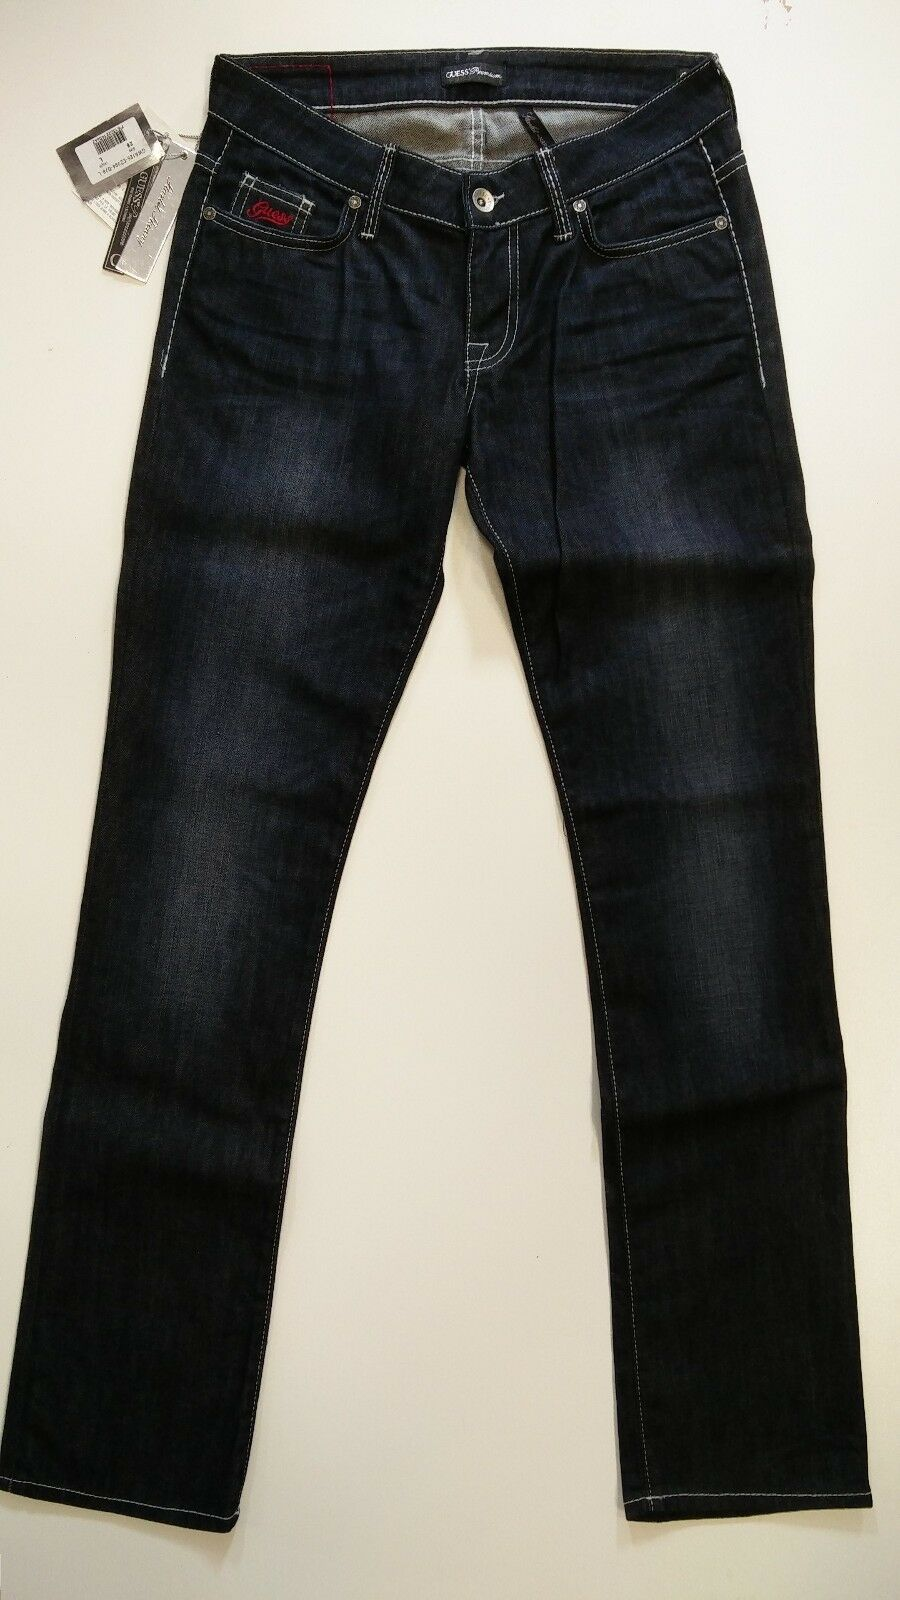 GUESS JEANS women GWA125-EZ394 Jeans Skinny Slim Fit Low Rise Denim bluee Jeans